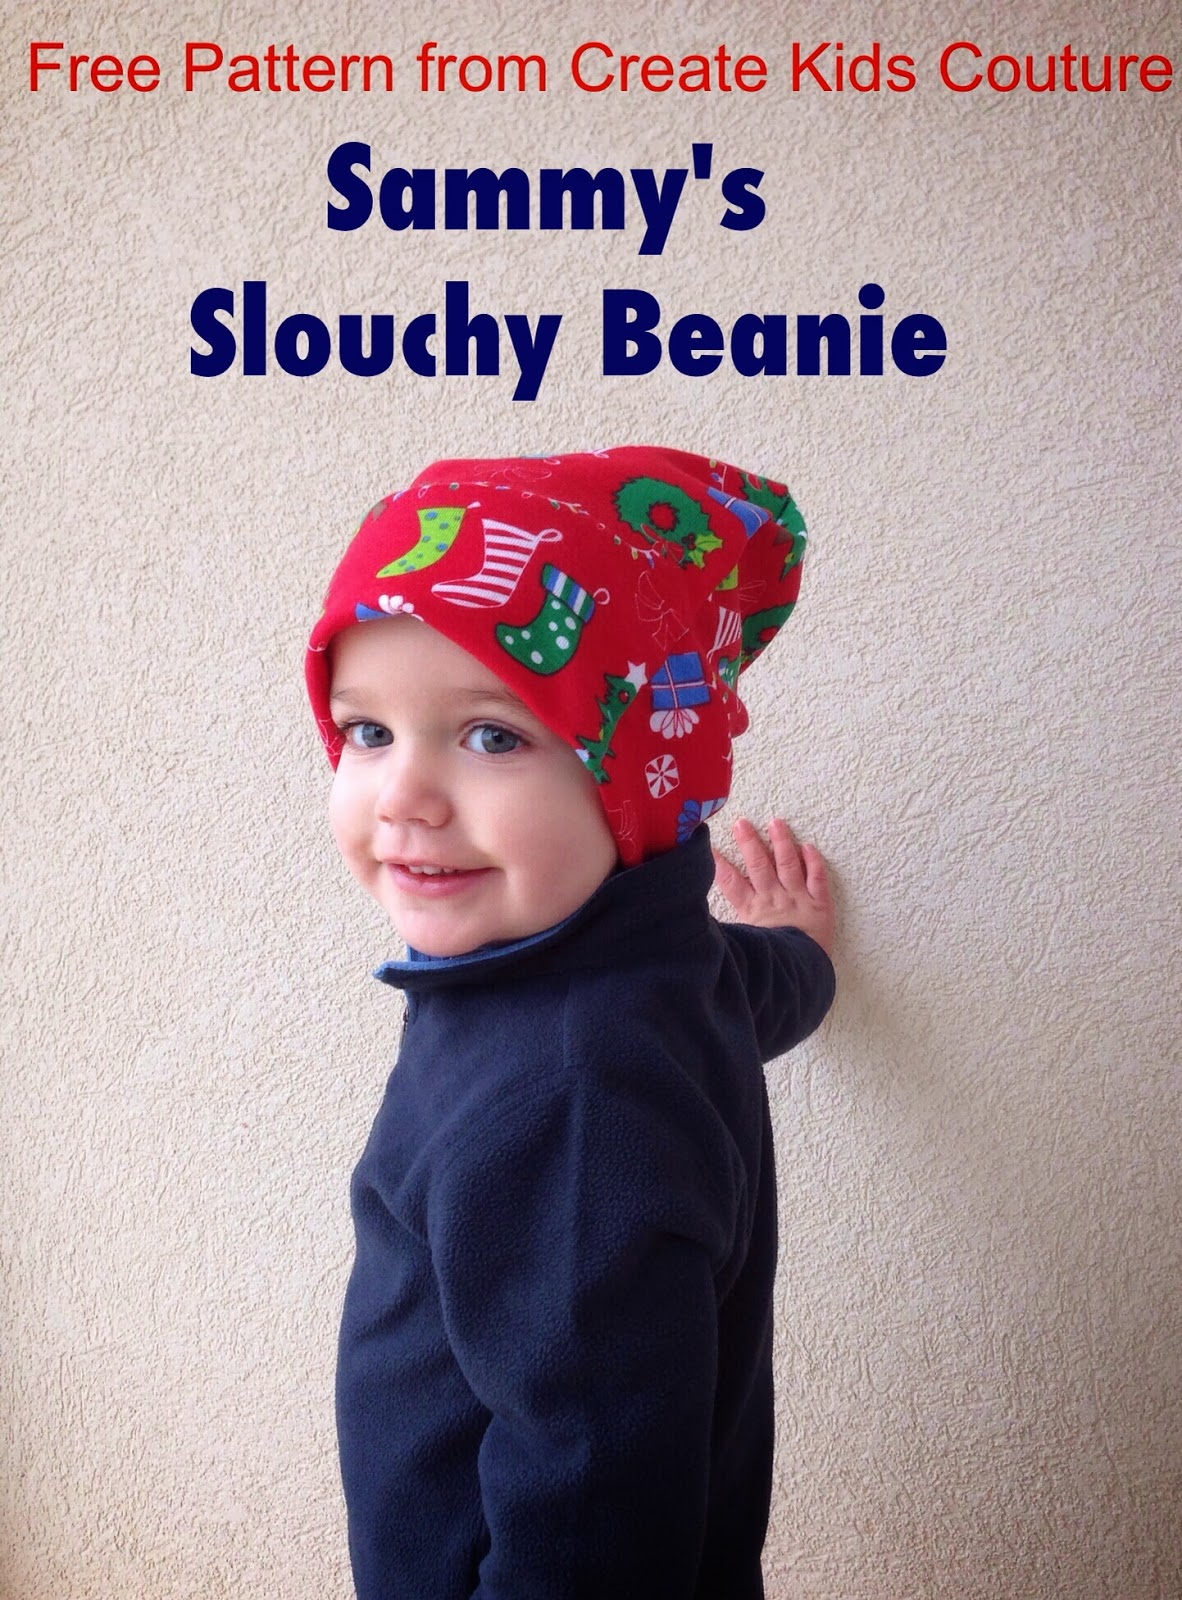 b95576503b2 Create Kids Couture  Free Pattern  Sammy s Slouchy Beanie